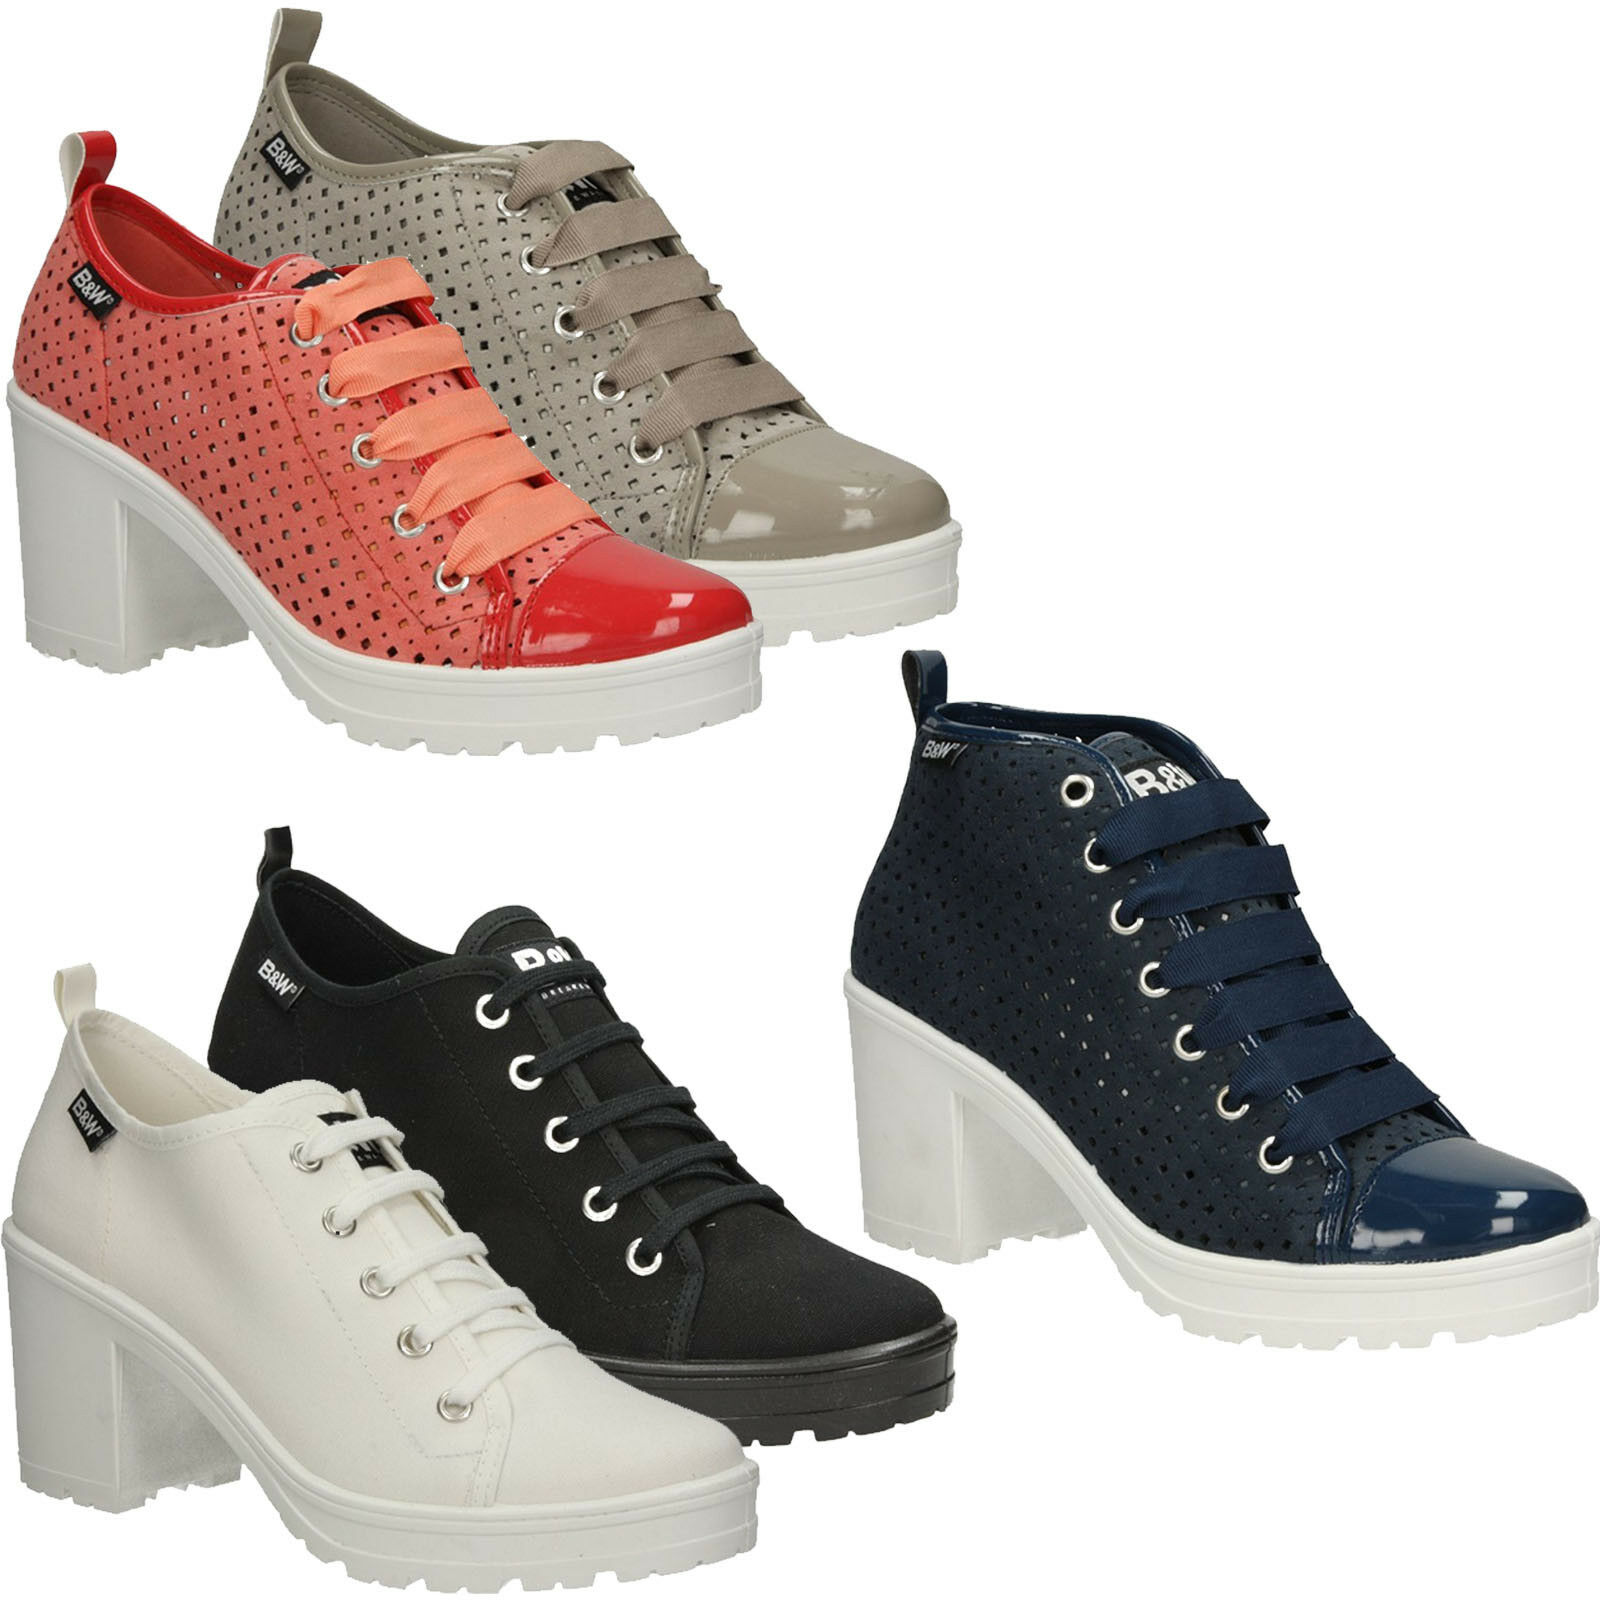 Zapatos Zapatos Zapatos señora zapatillas b&w bloque apartado schnürzapatos a la moda talla 36-41 nuevo  de moda